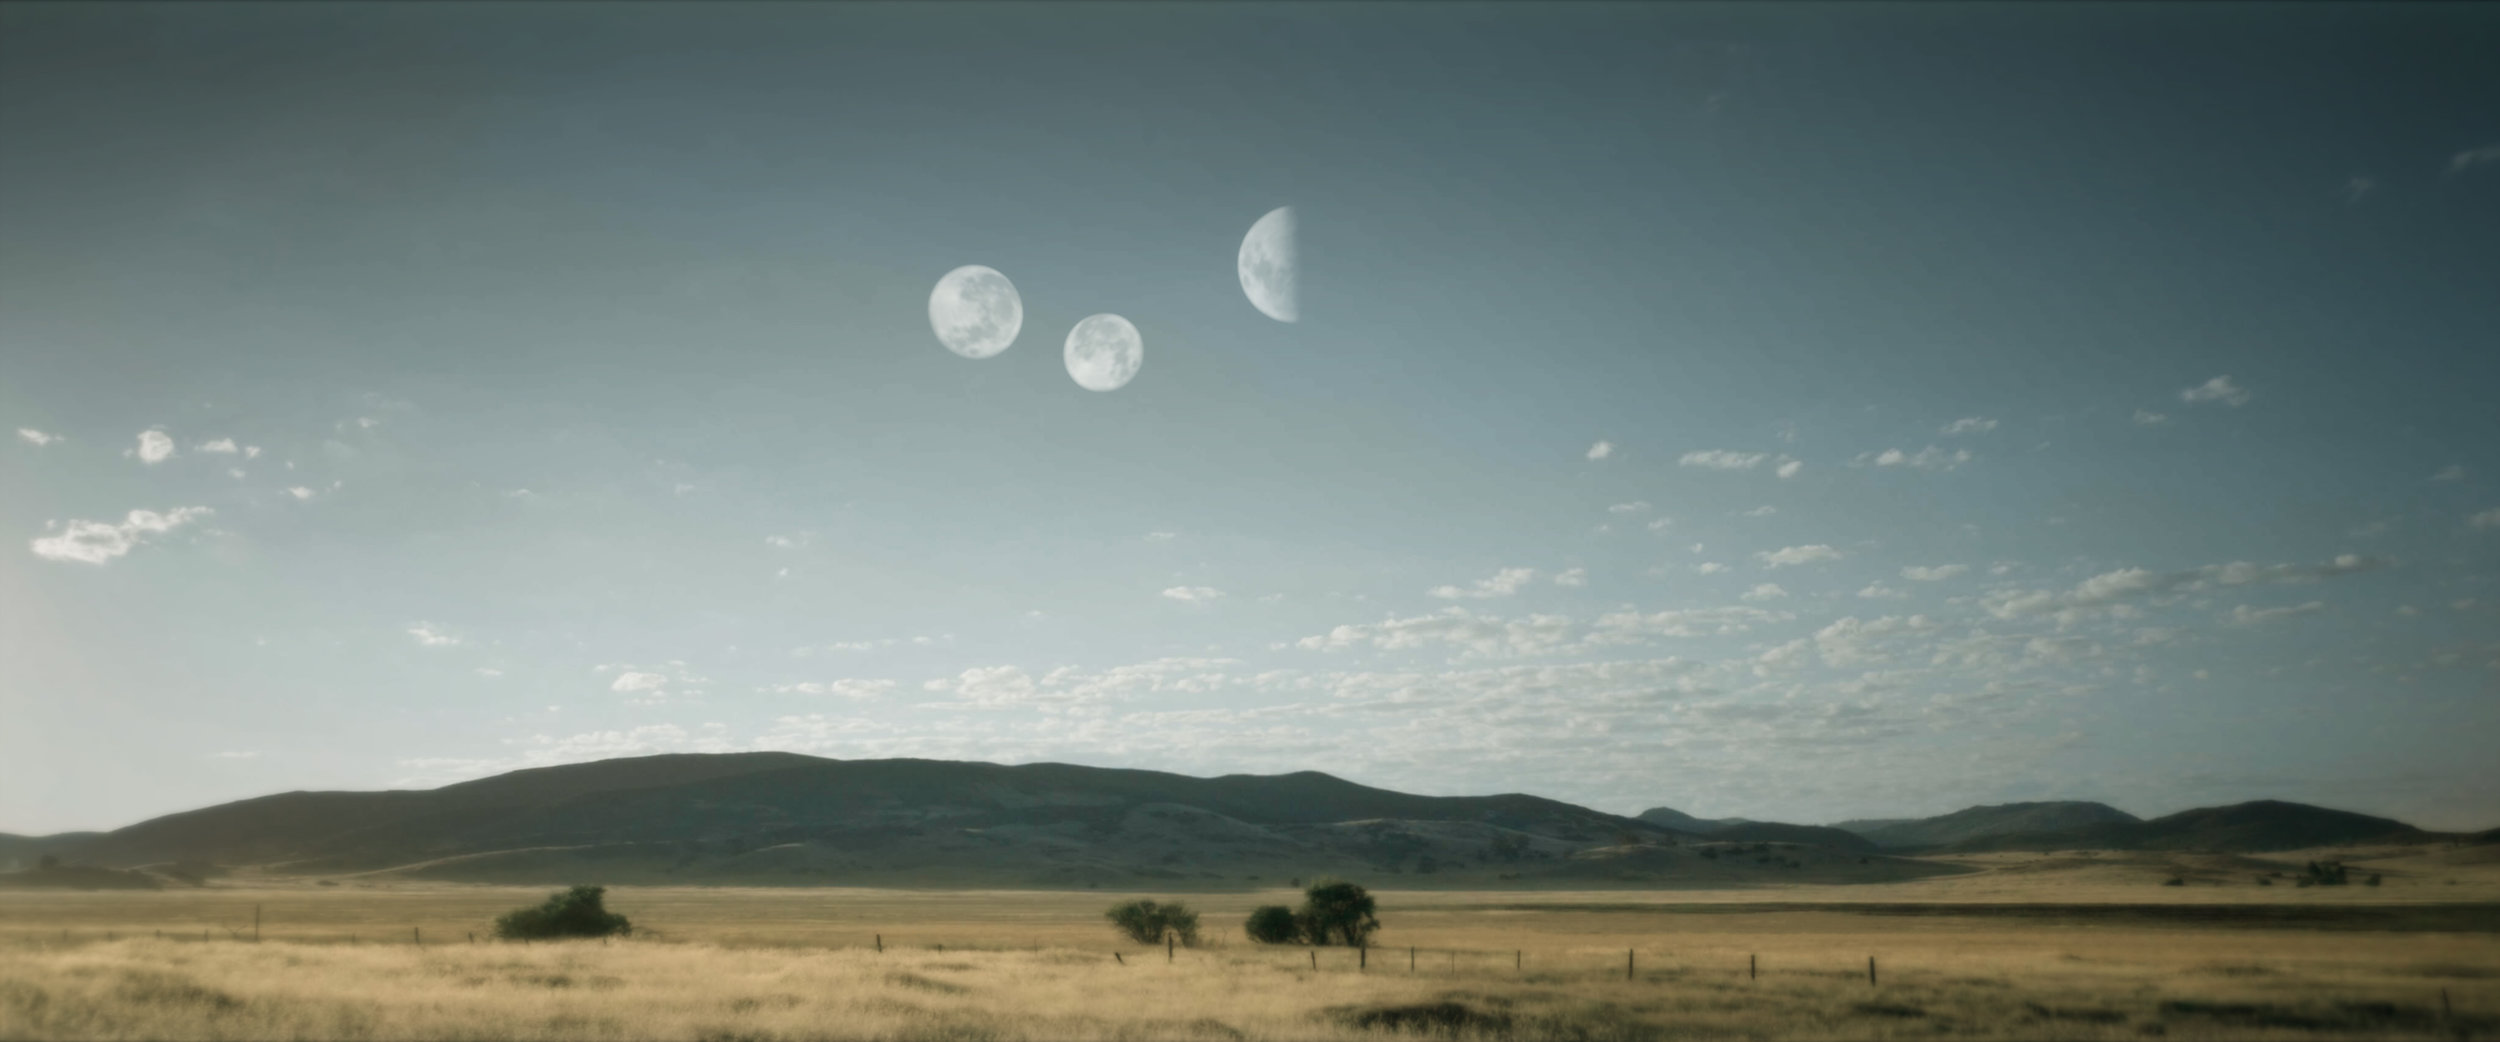 the-endless-moons.jpg